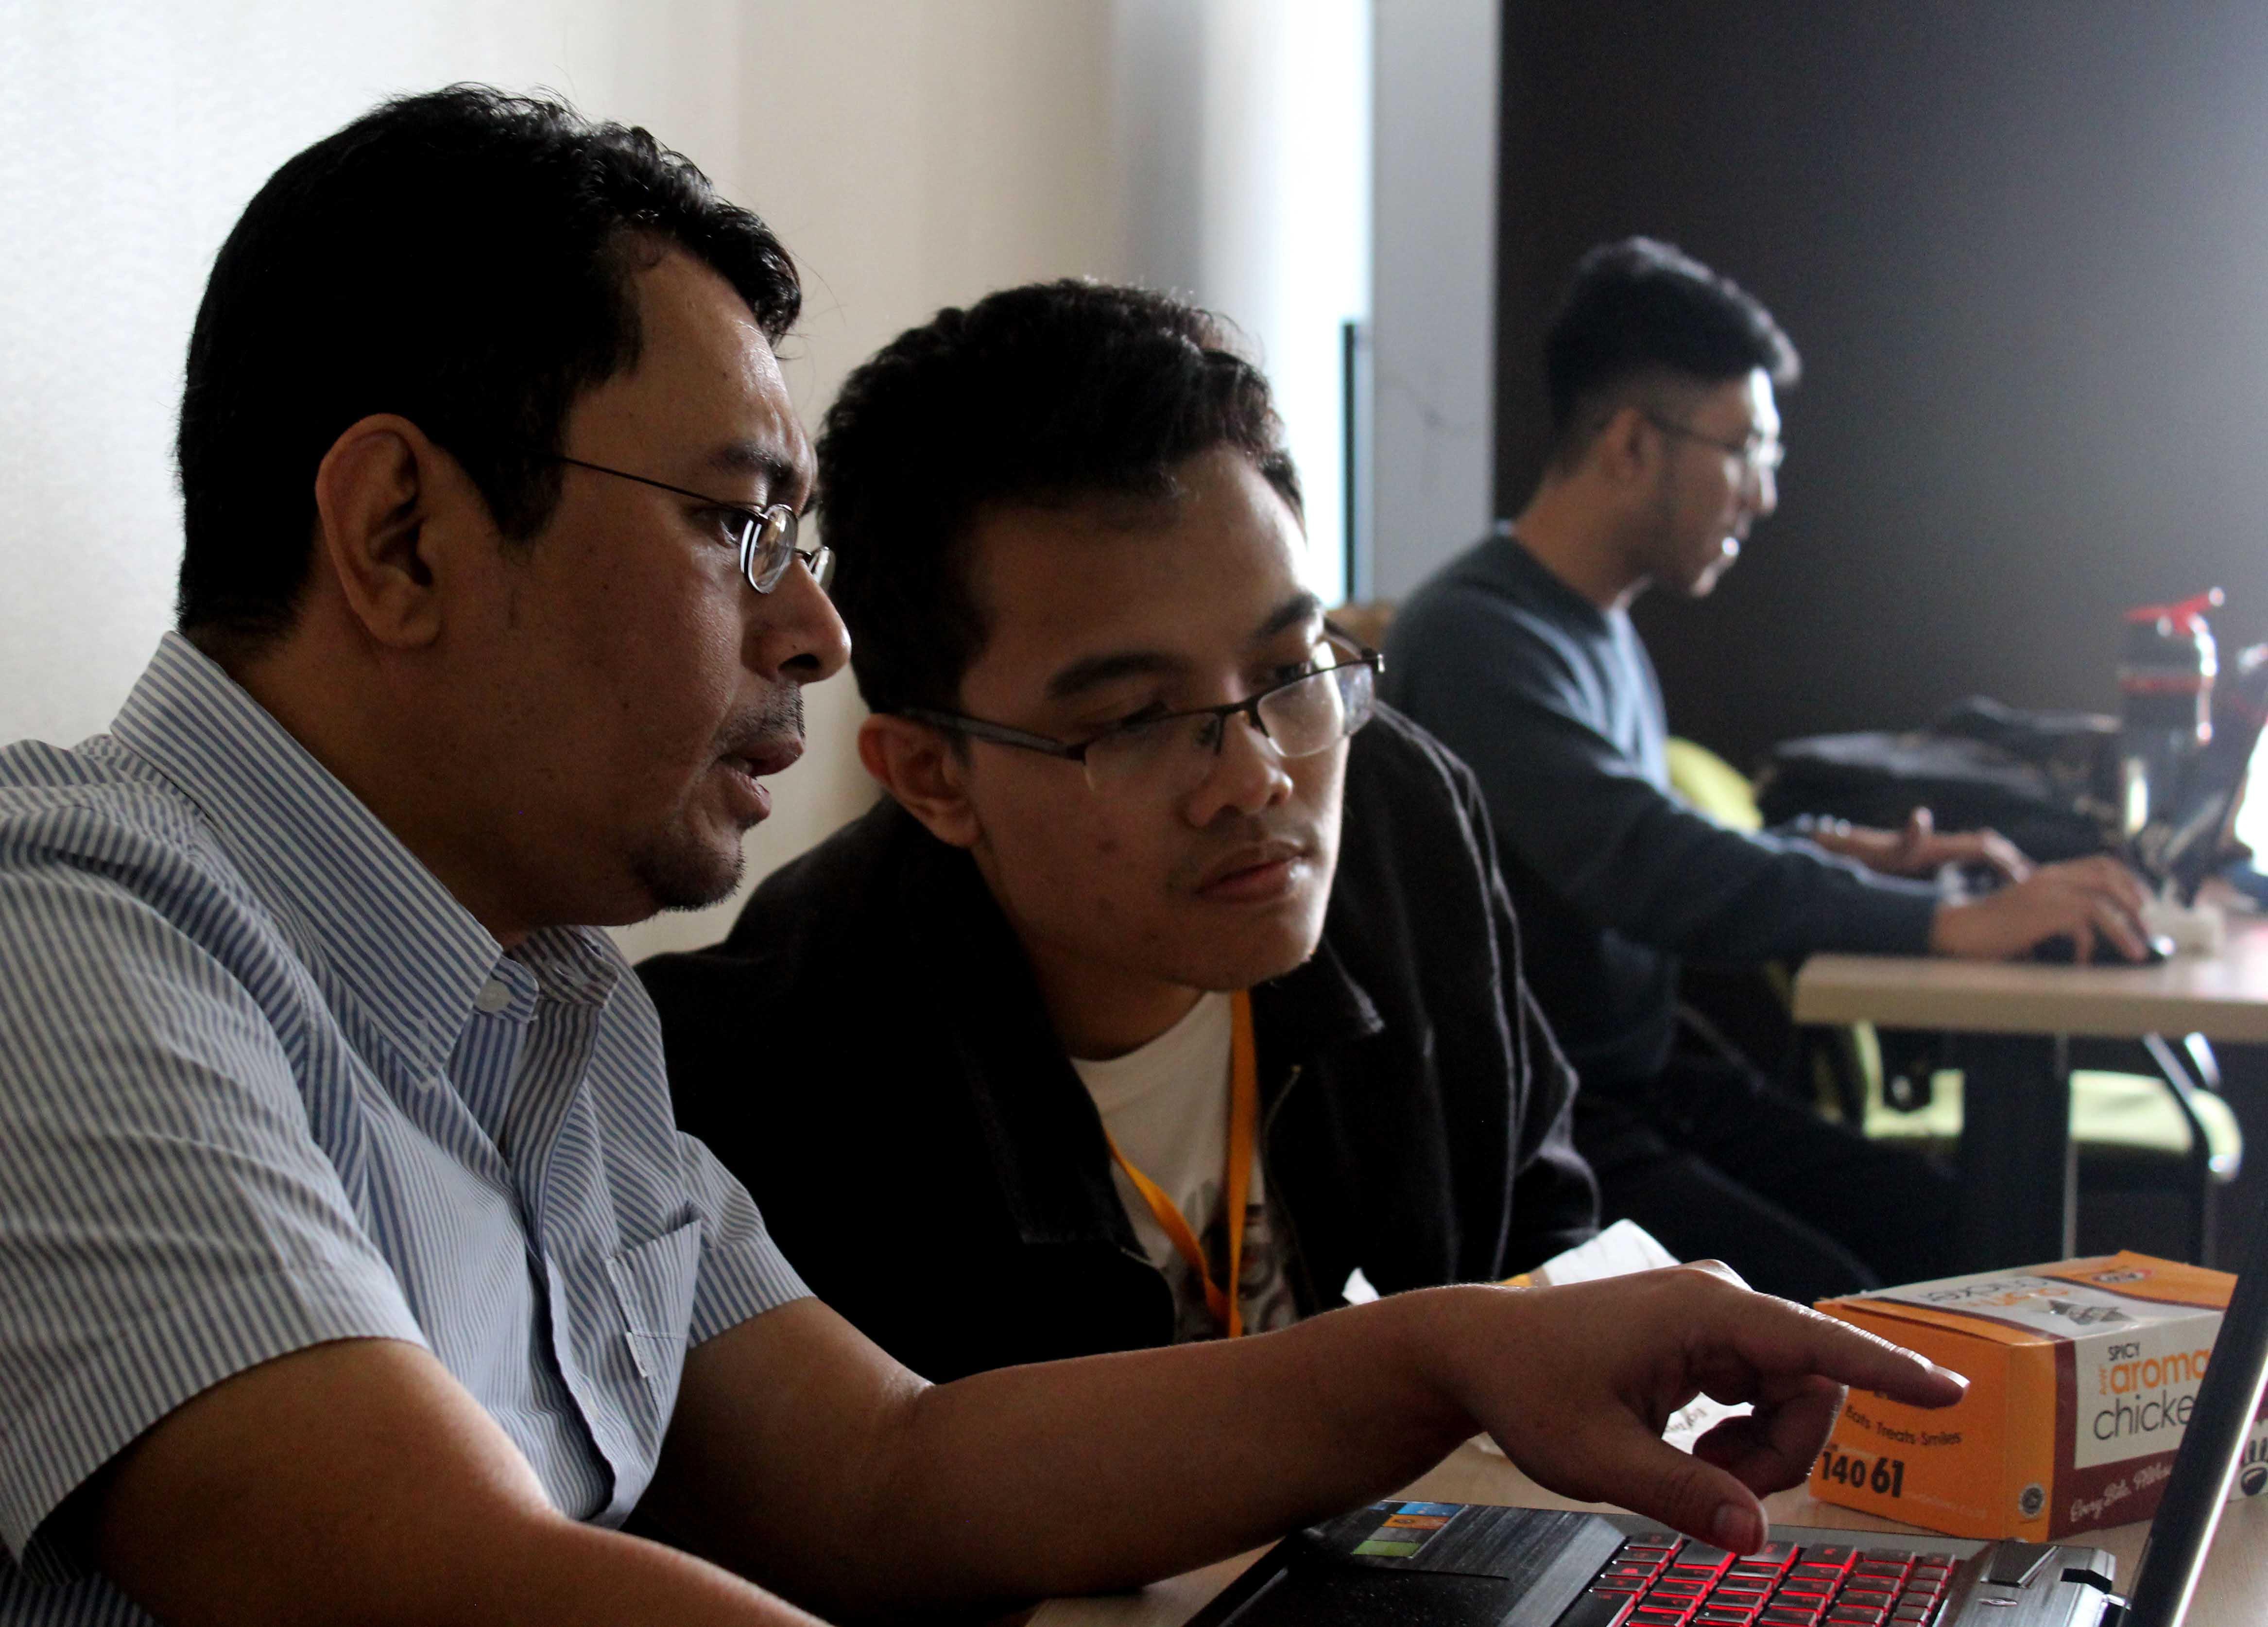 RAE Widiargo selaku dosen Animasi sedang membimbing mahasiswa dalam penyelesaian video animasi yang sedang dibuat. (2)